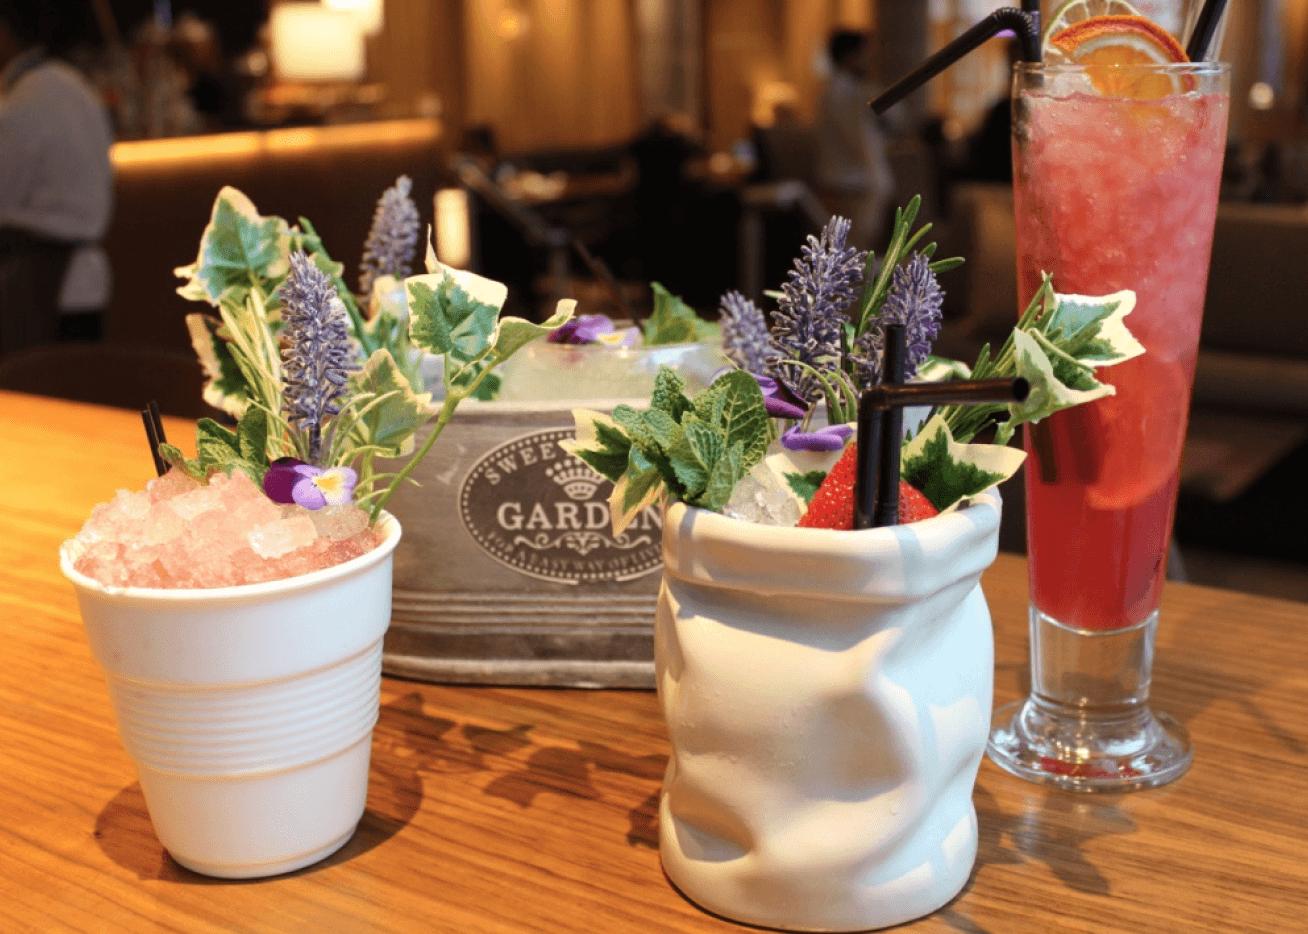 Sampling some stunning cocktails in TwoRuba's Spring Garden